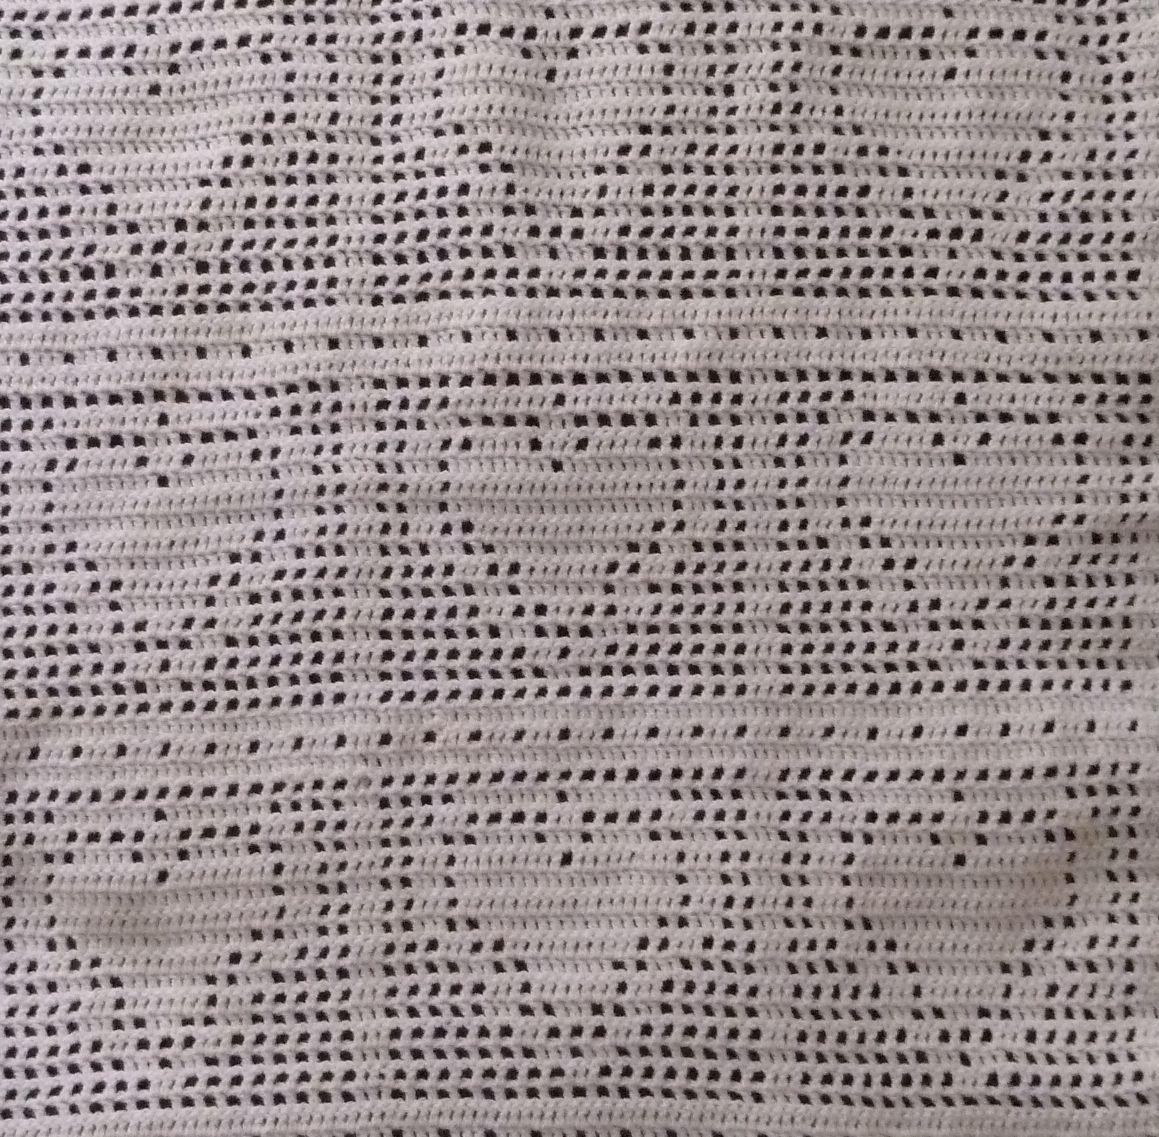 Bordered Heart Crochet Filet Blanket (Close up) Bordered Heart Filet ...